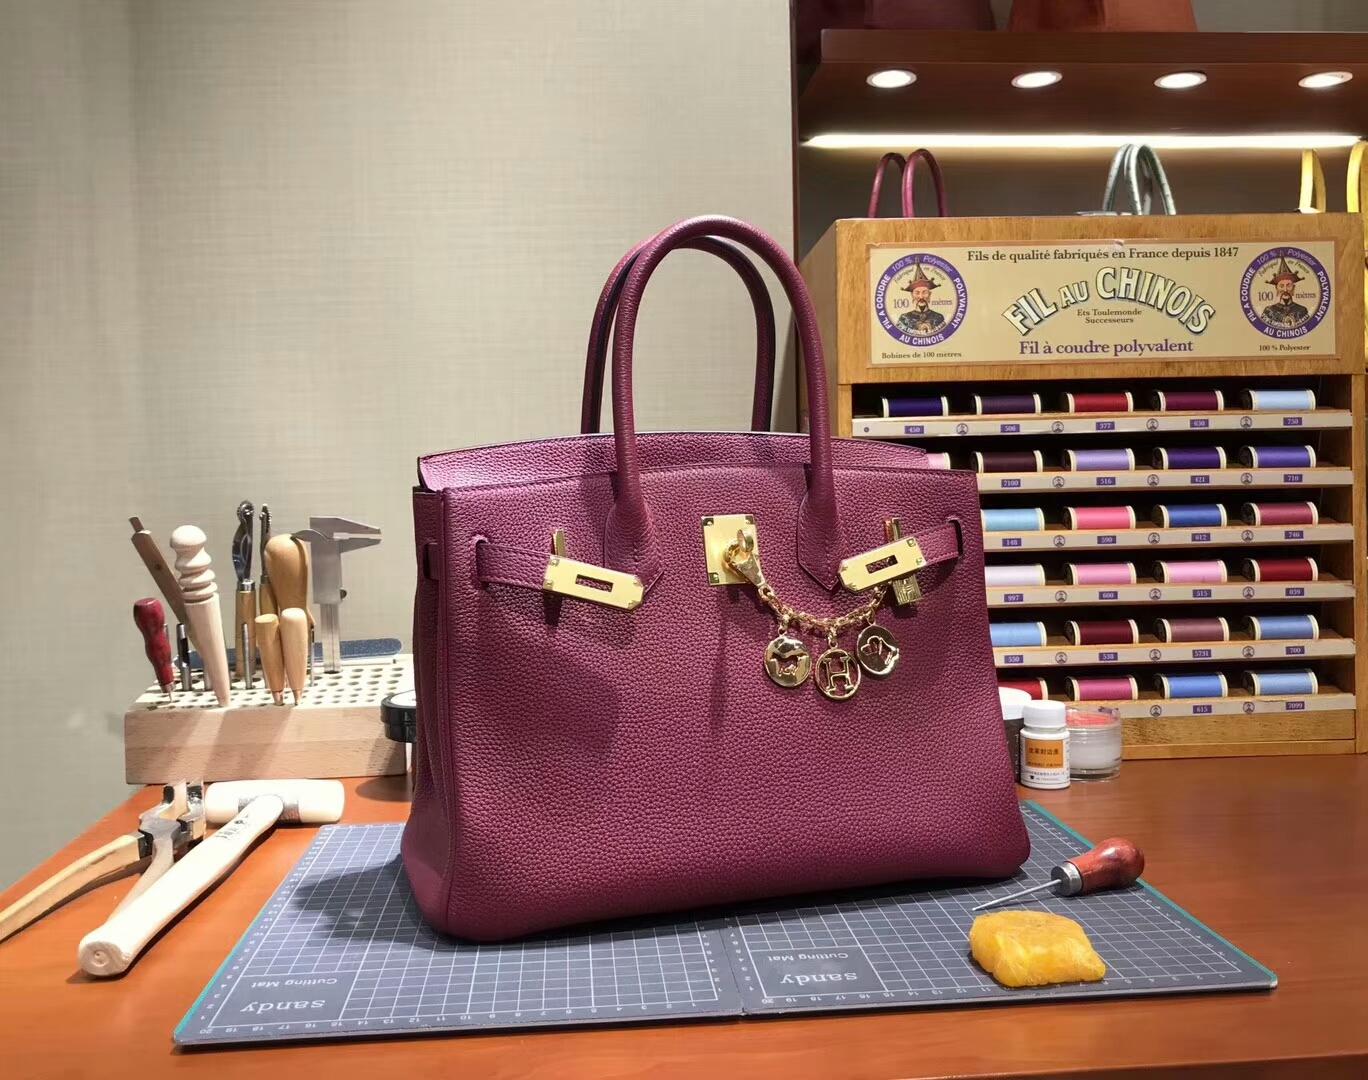 Ruby 宝石红 B5  爱马仕 HERMES 铂金包 Birkin 30cm 配全套专柜原版包装 全球发售